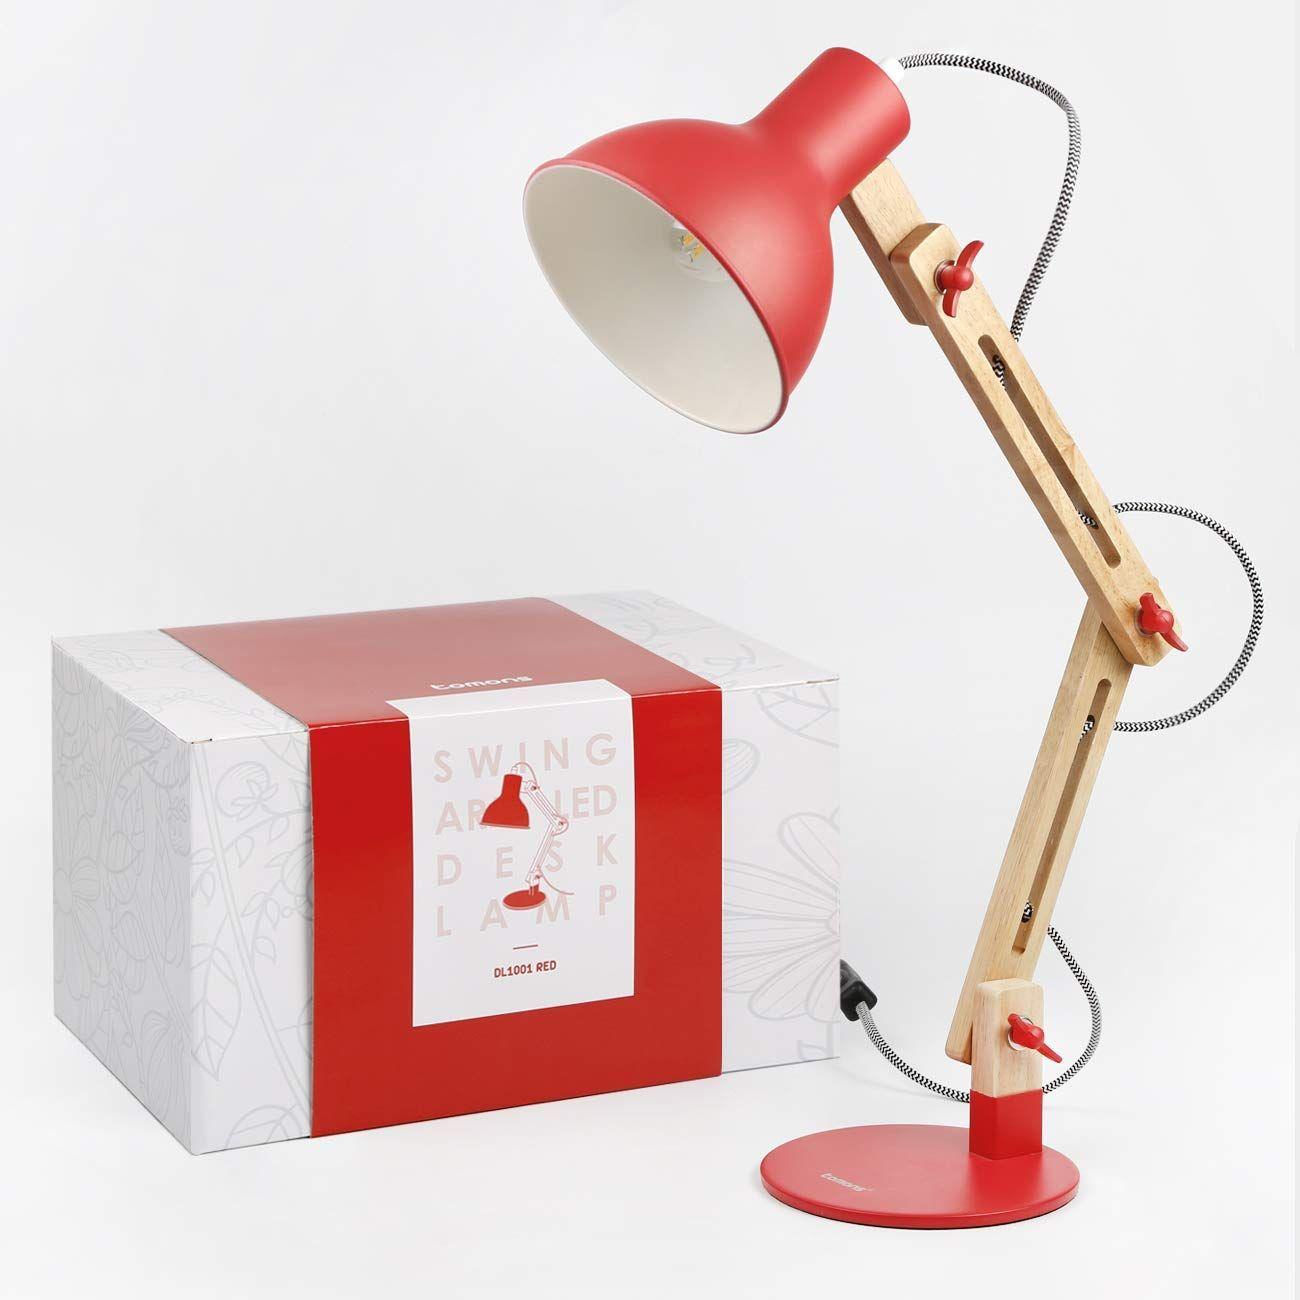 Tomons Led Leselampe Im Klassichen Holz Design Retro Schreibtischlampe Kinder Led Tischleuchte Verstellbare Verstellba Schreibtischlampe Led Leselampe Lampe